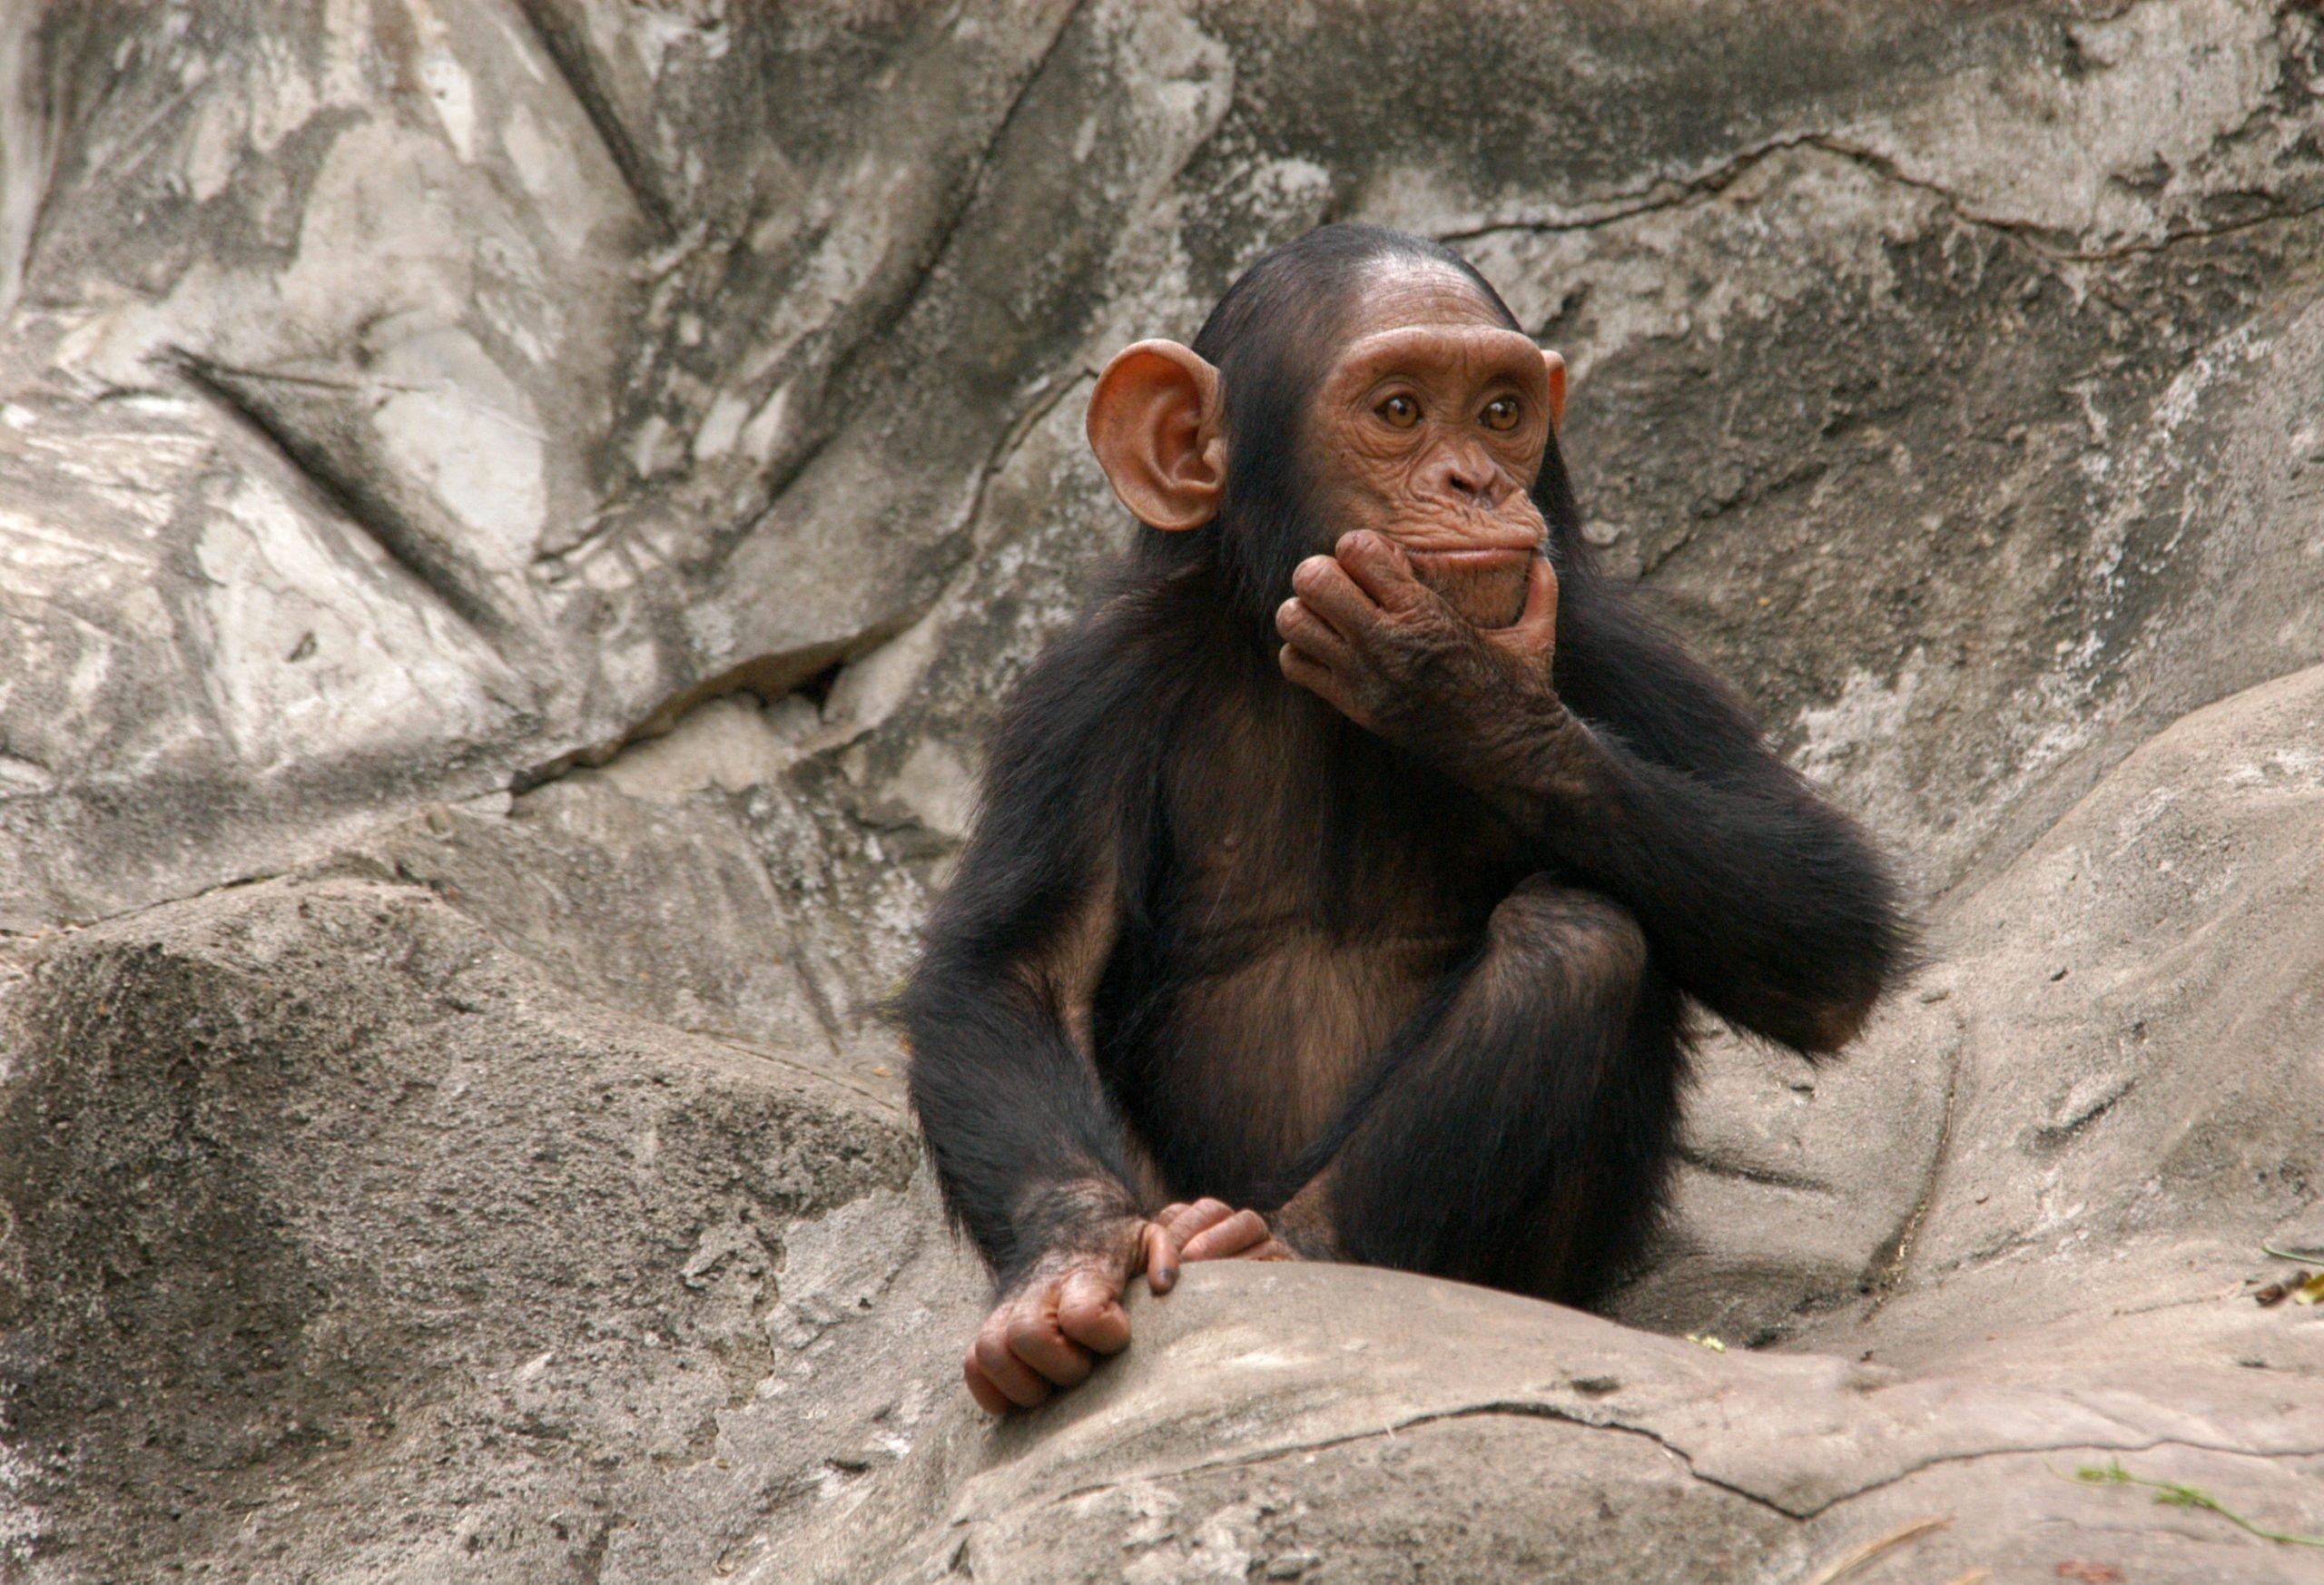 Baby chimpanzee sitting on rocks